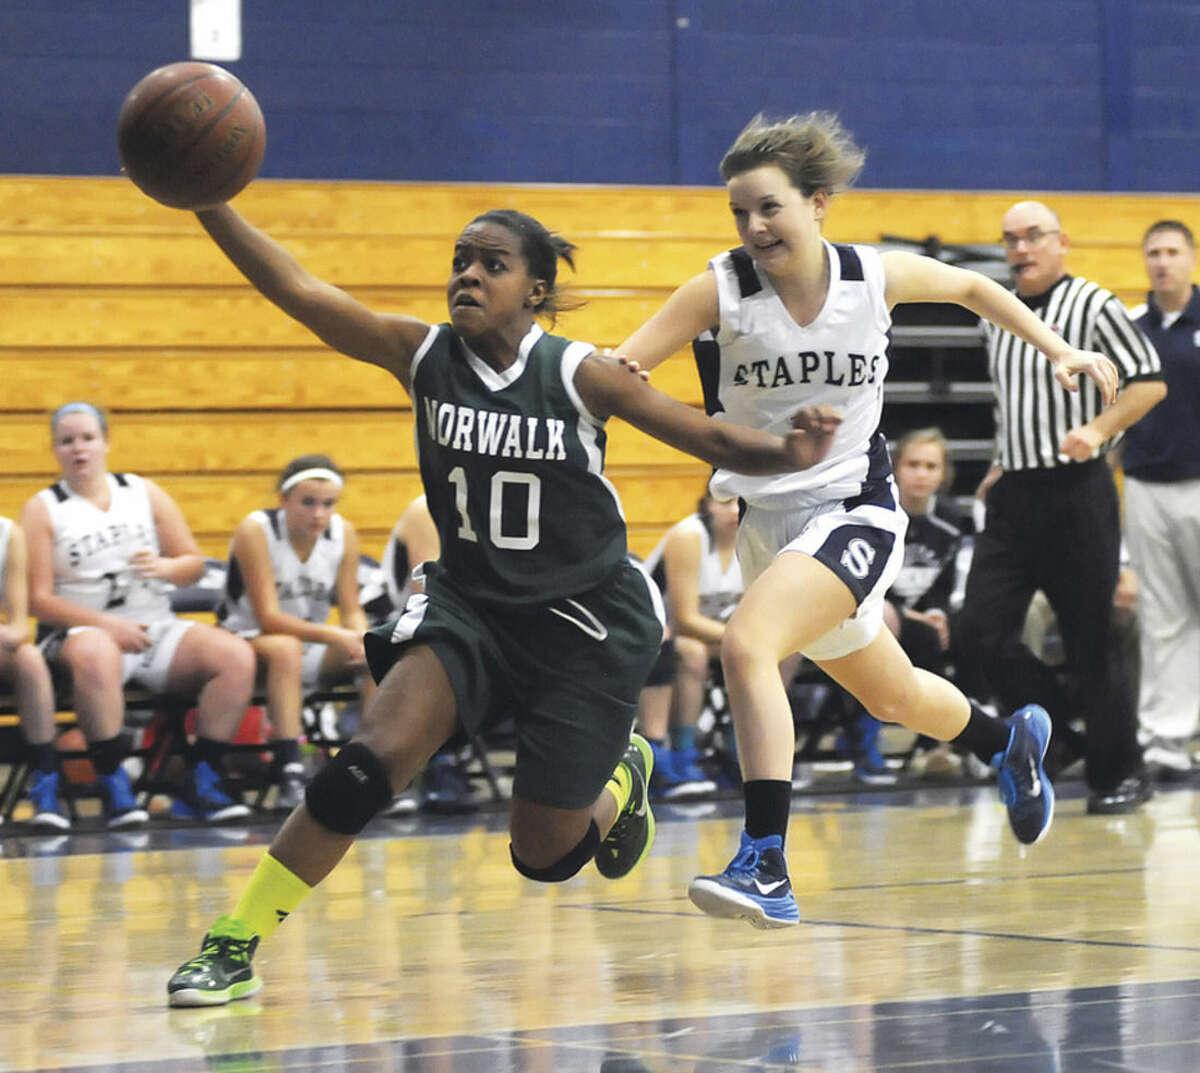 Hour photo/John Nash Norwalk's Jackie Harris, left, tracks down a ball in front of Staples' Rachel Seideman during Wednesday's season-opening FCIAC girls basketball game in Westport. Staples won, 43-38.